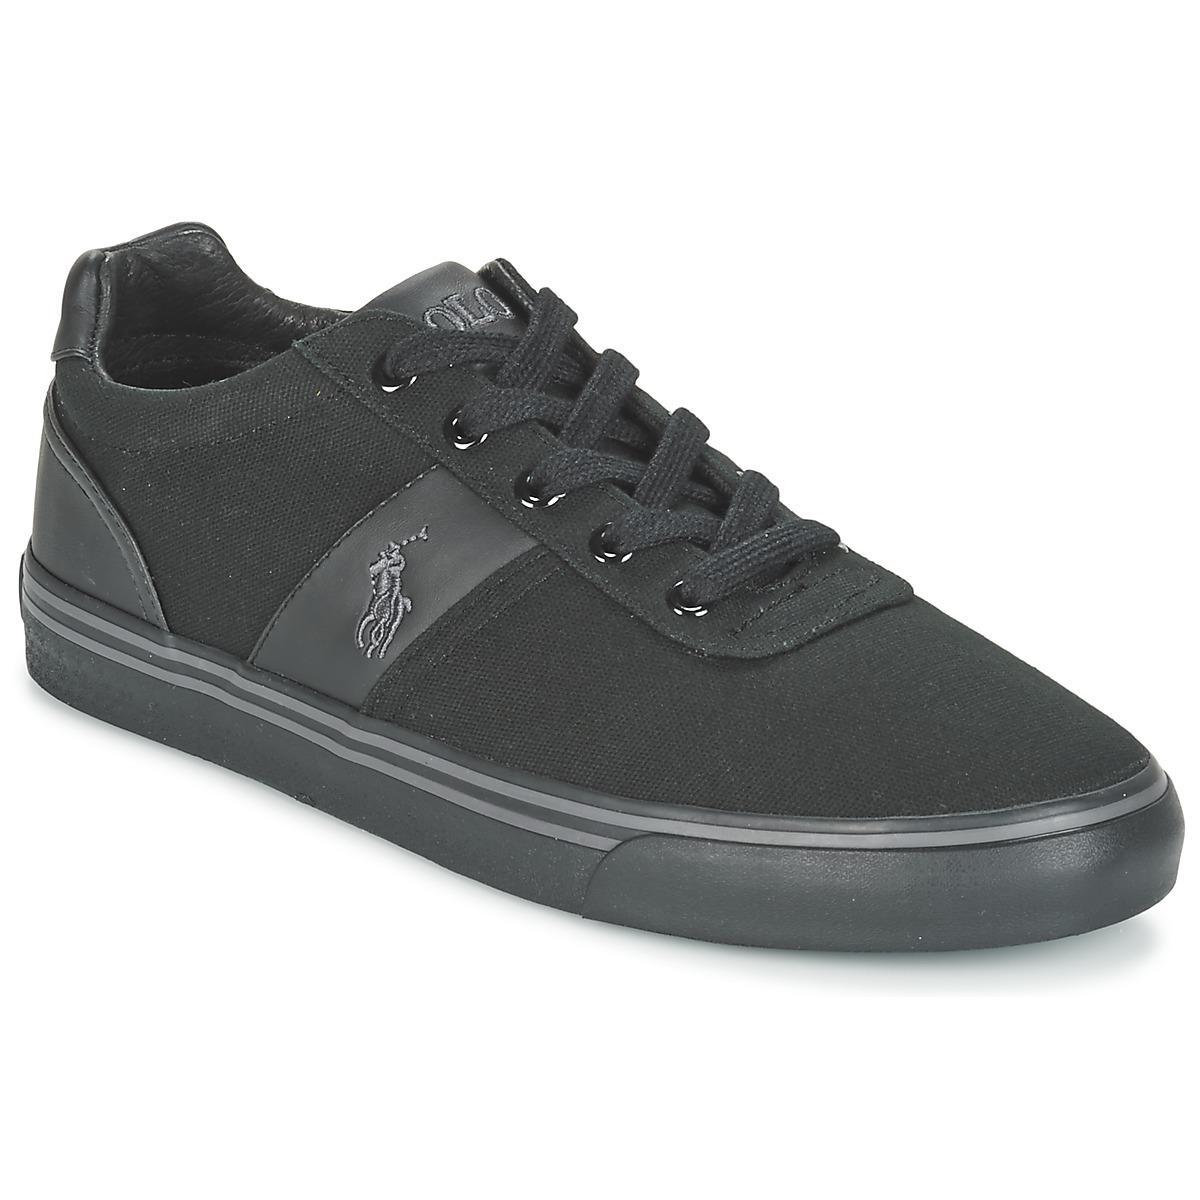 0a59e645c166e Polo Ralph Lauren Hanford-ne Men s Shoes (trainers) In Black in ...